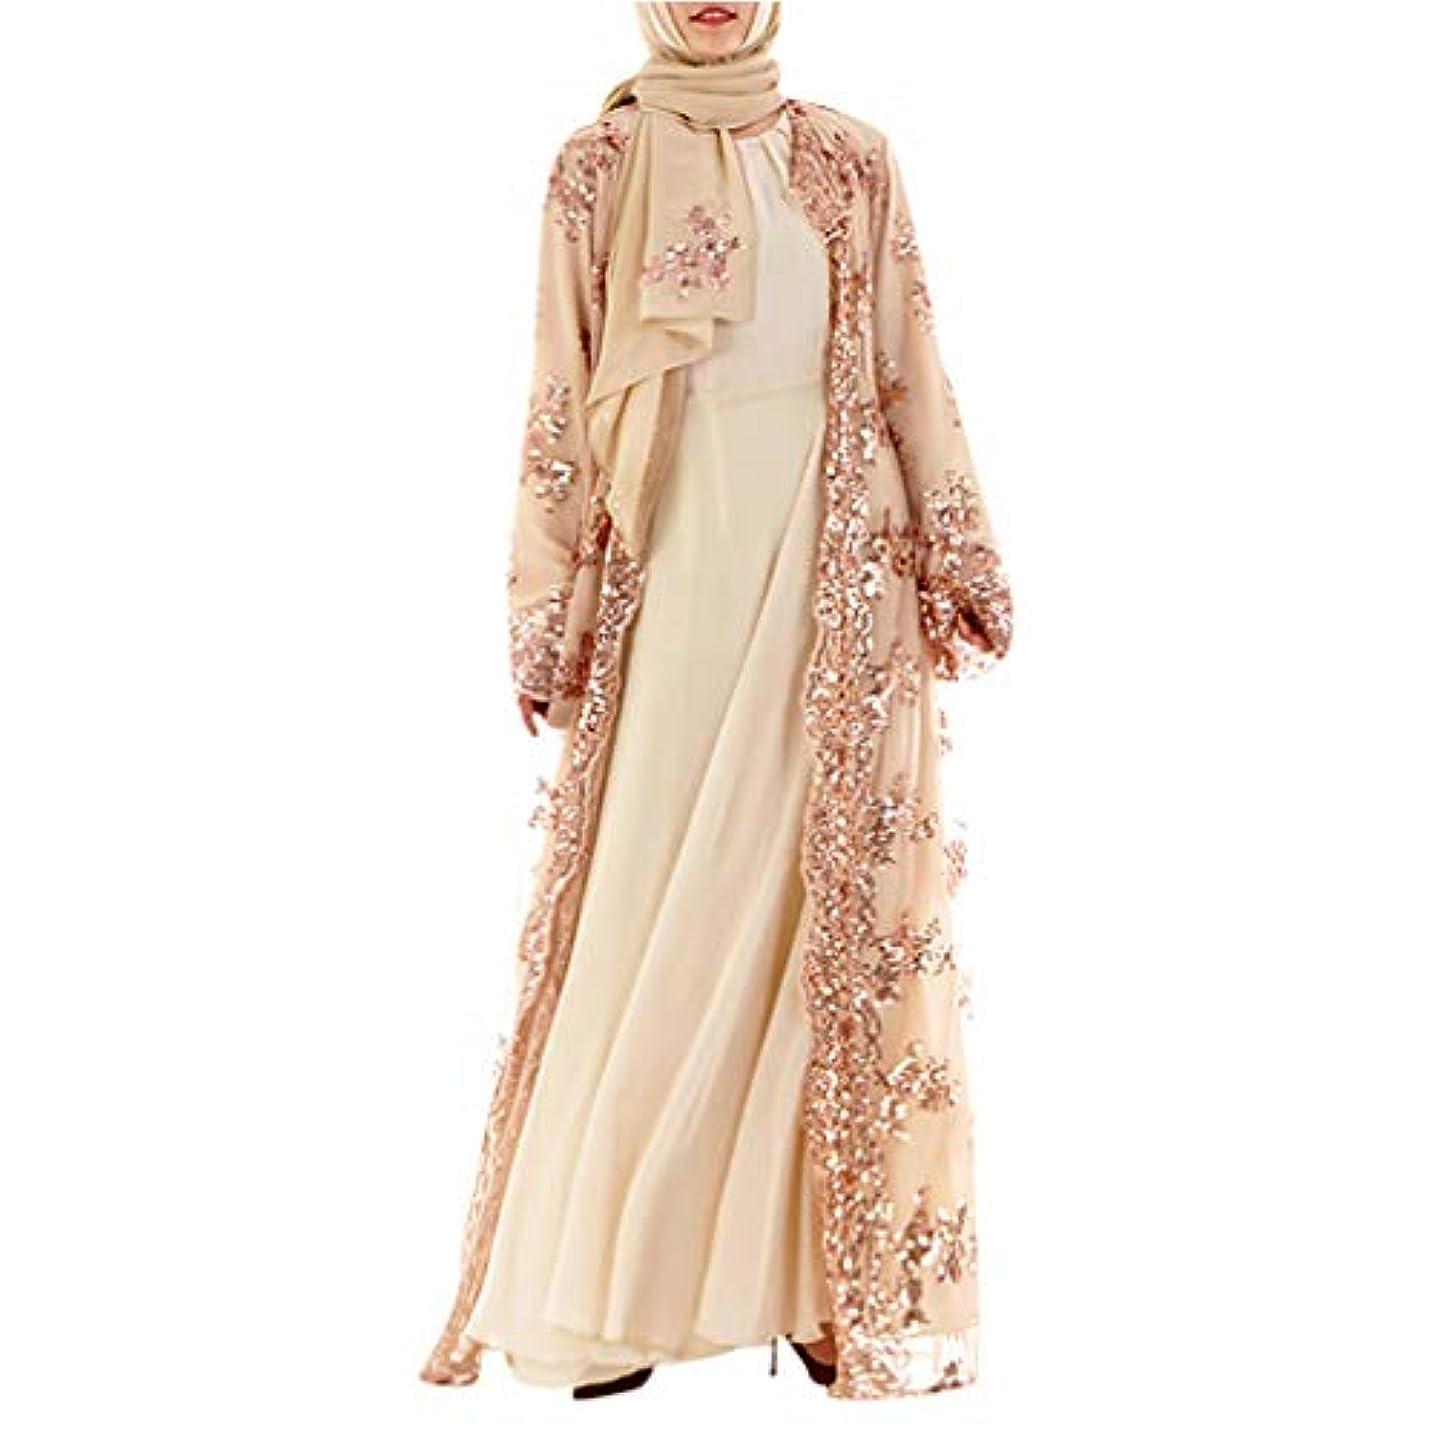 Pengy Woman Muslim Lace Dress Sequin Cardigan Maxi Dress Kimono Open Abaya Robe Kaftan Dubai Dress